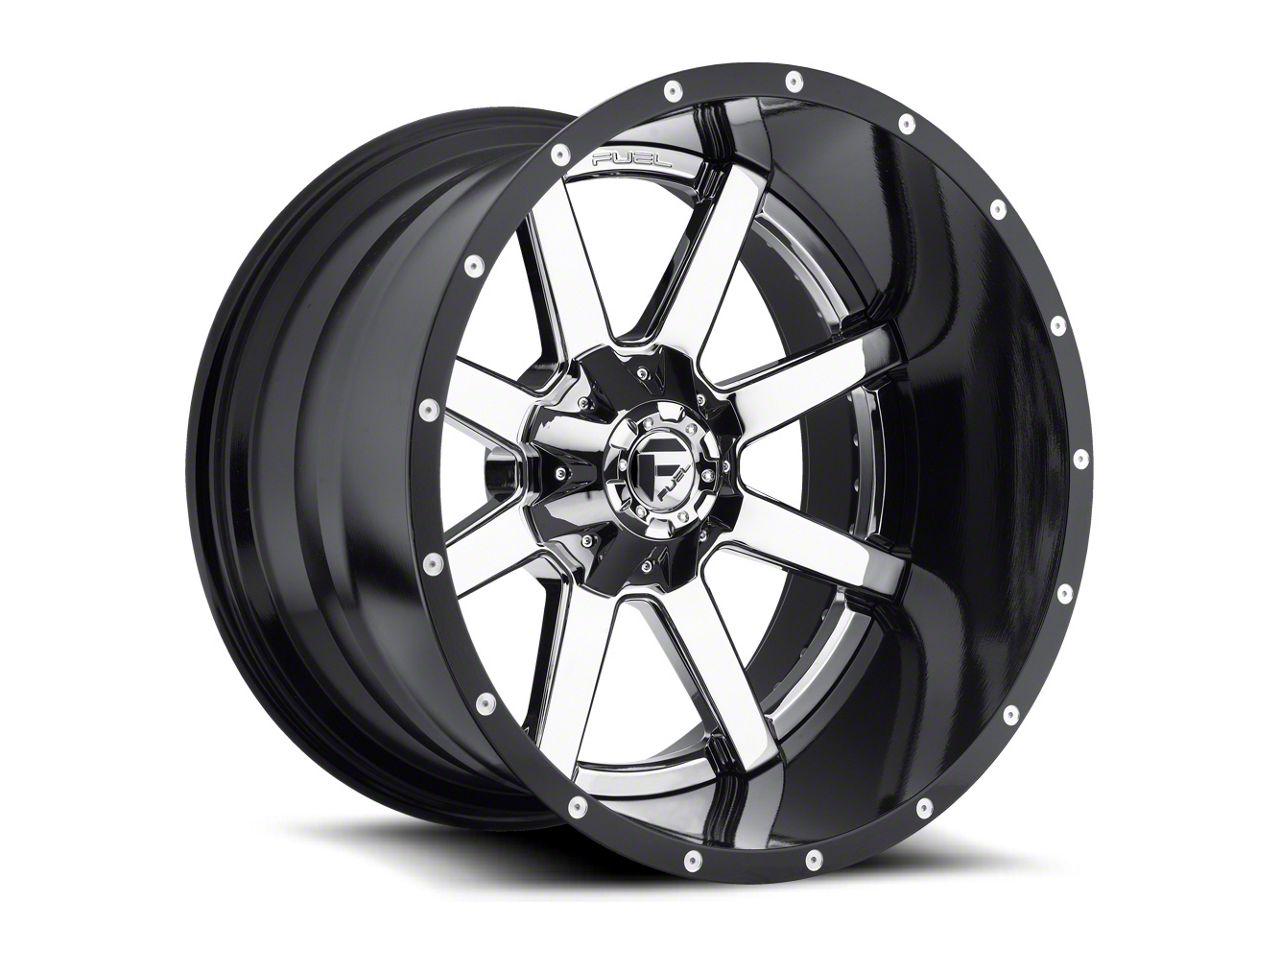 Fuel Wheels Maverick 2-Piece Chrome 6-Lug Wheel - 20x12 (04-19 F-150)